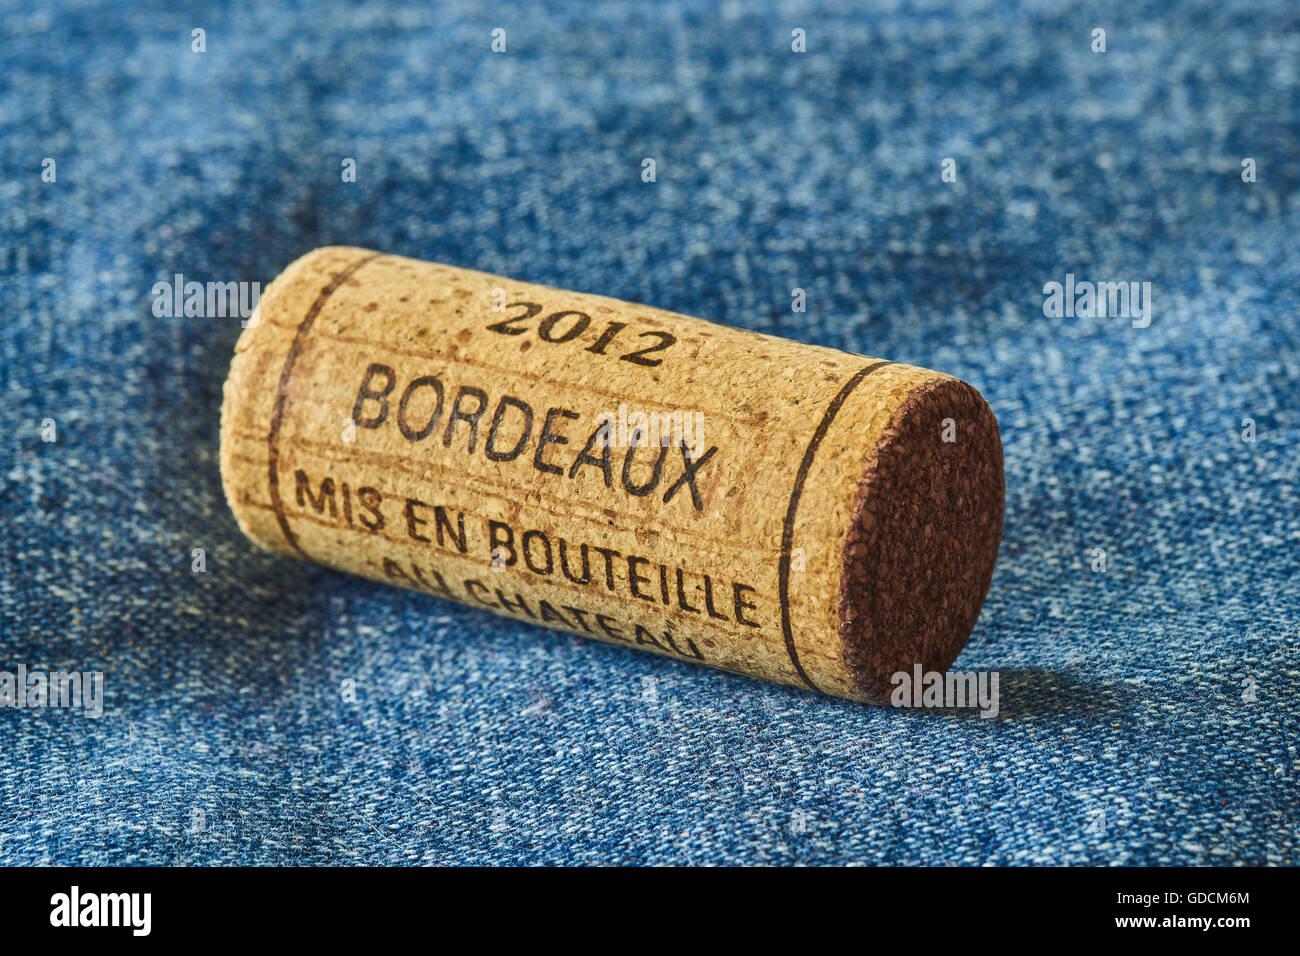 Bordeaux 2012 french wine cork stopper - Stock Image